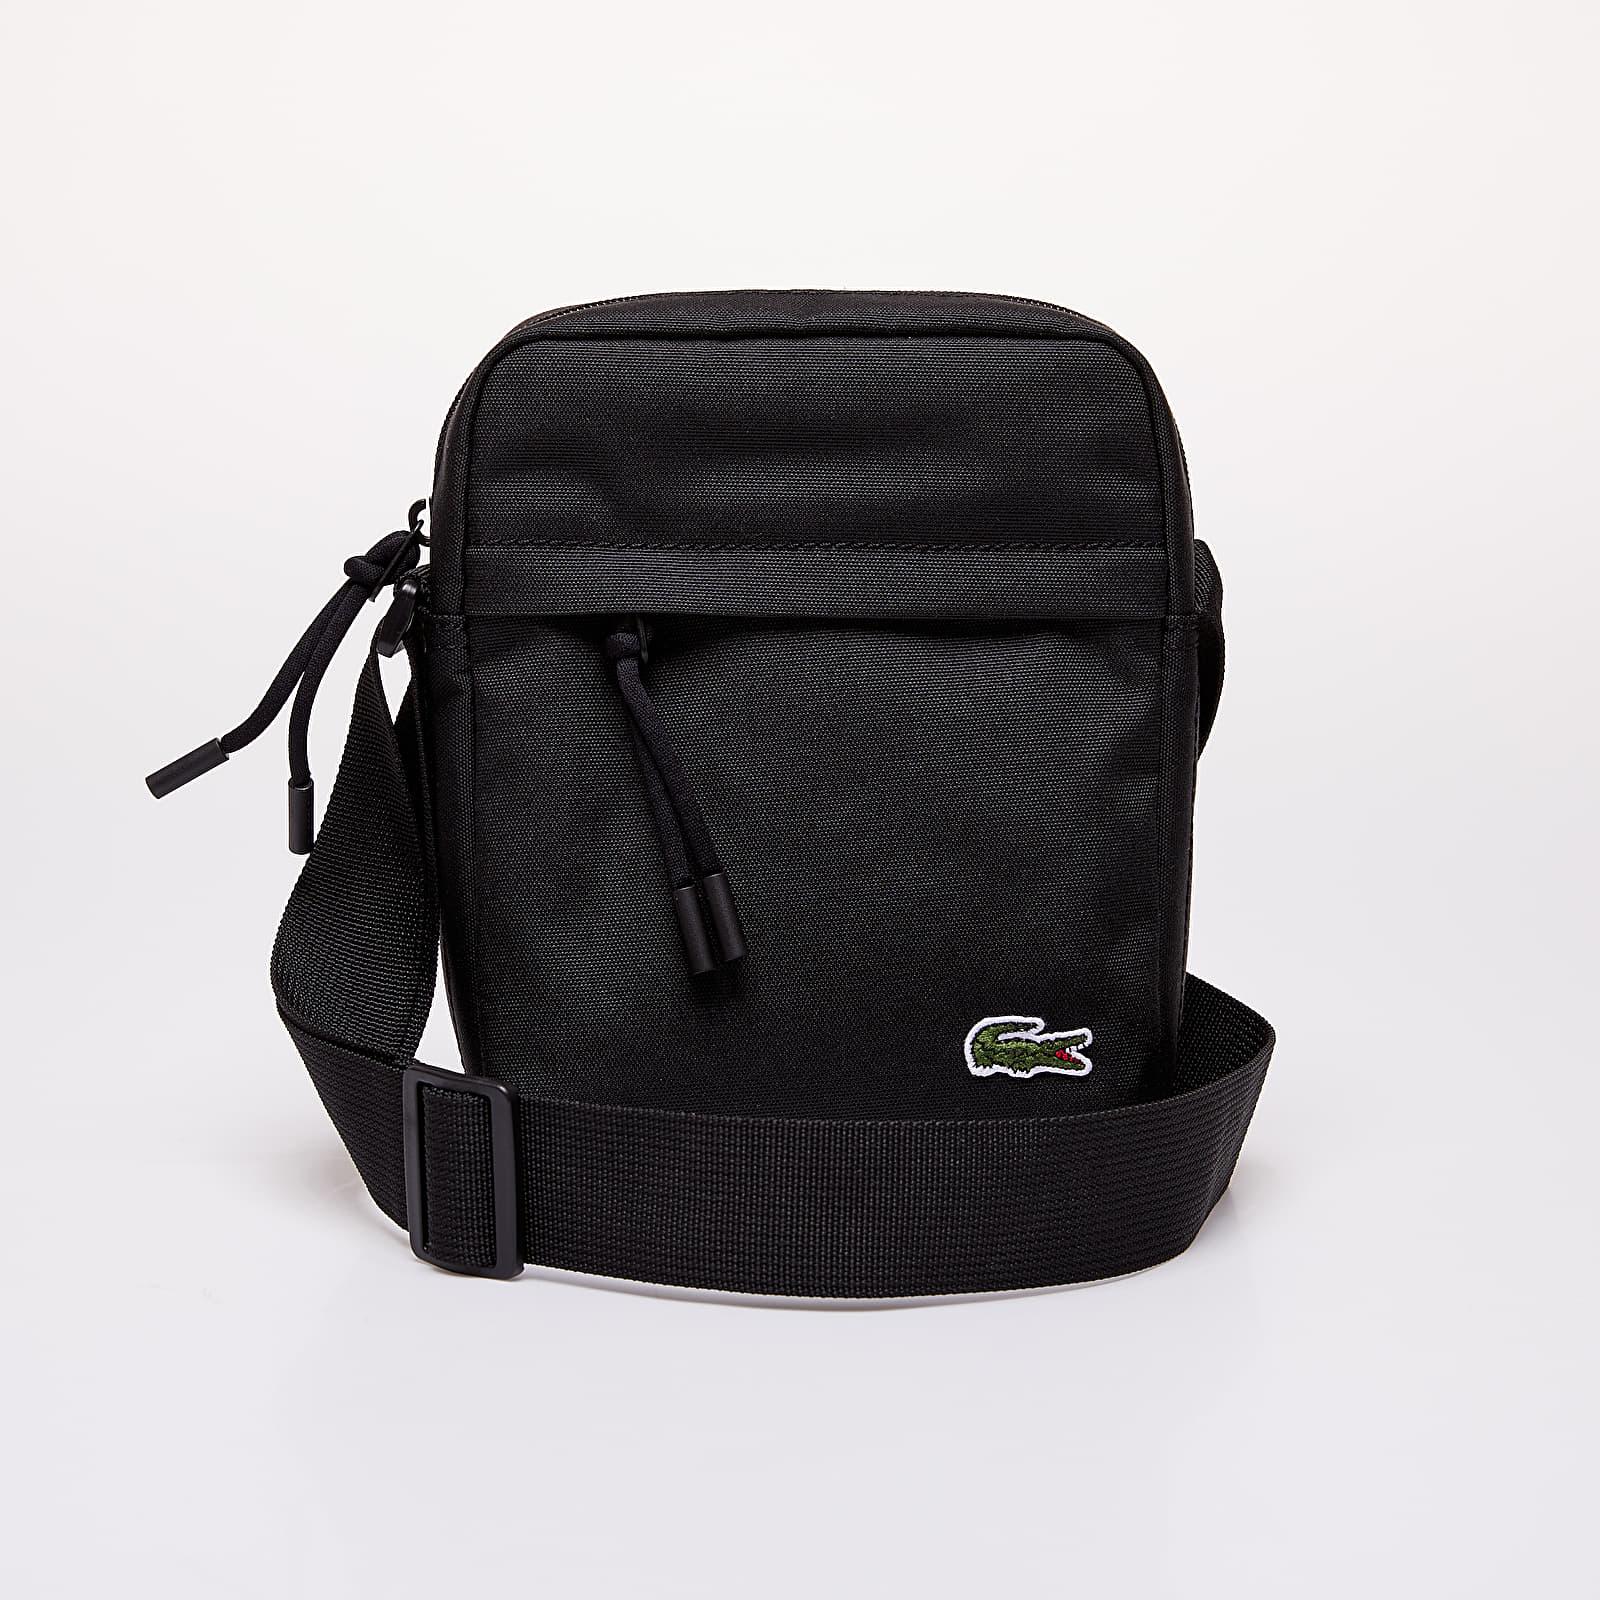 Bags and backpacks LACOSTE Neocroc Vertical Camera Bag Black